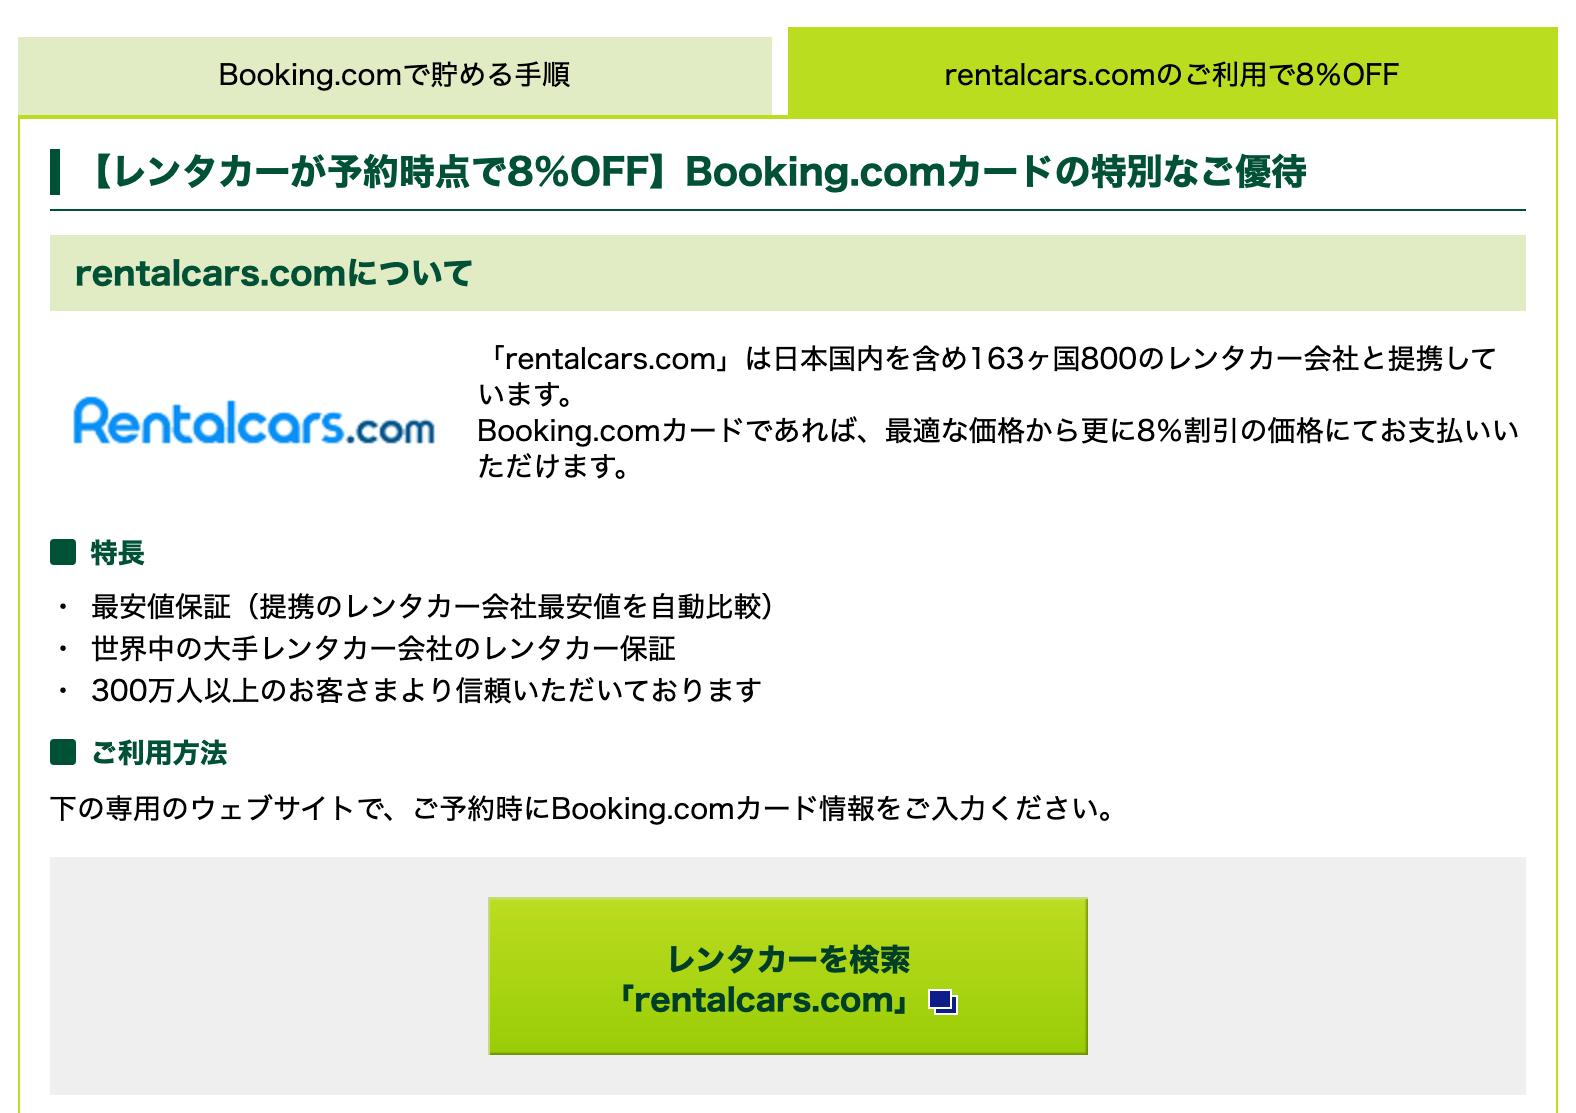 Booking.comカード Vpass Booking.comカード専用レンタカー予約サイトへの案内